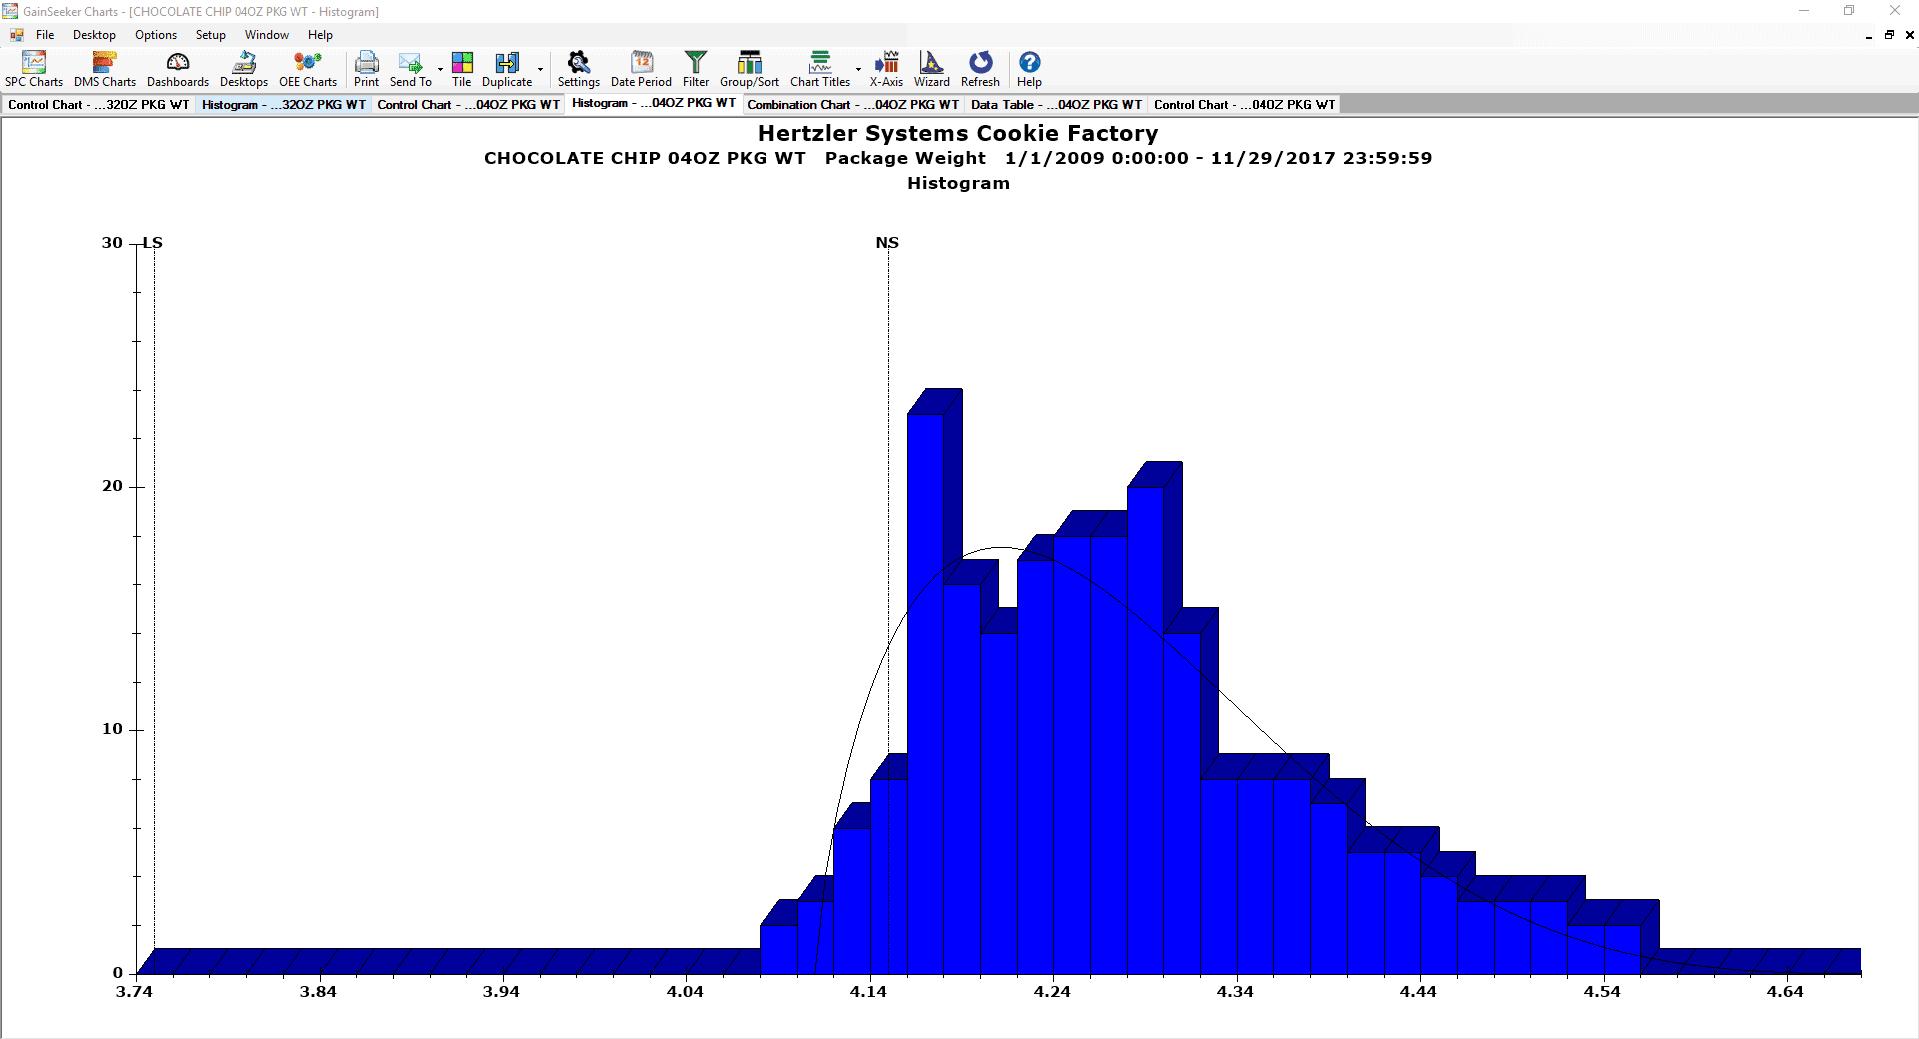 GainSeeker Statistical Process Control (SPC) Distribution Histogram